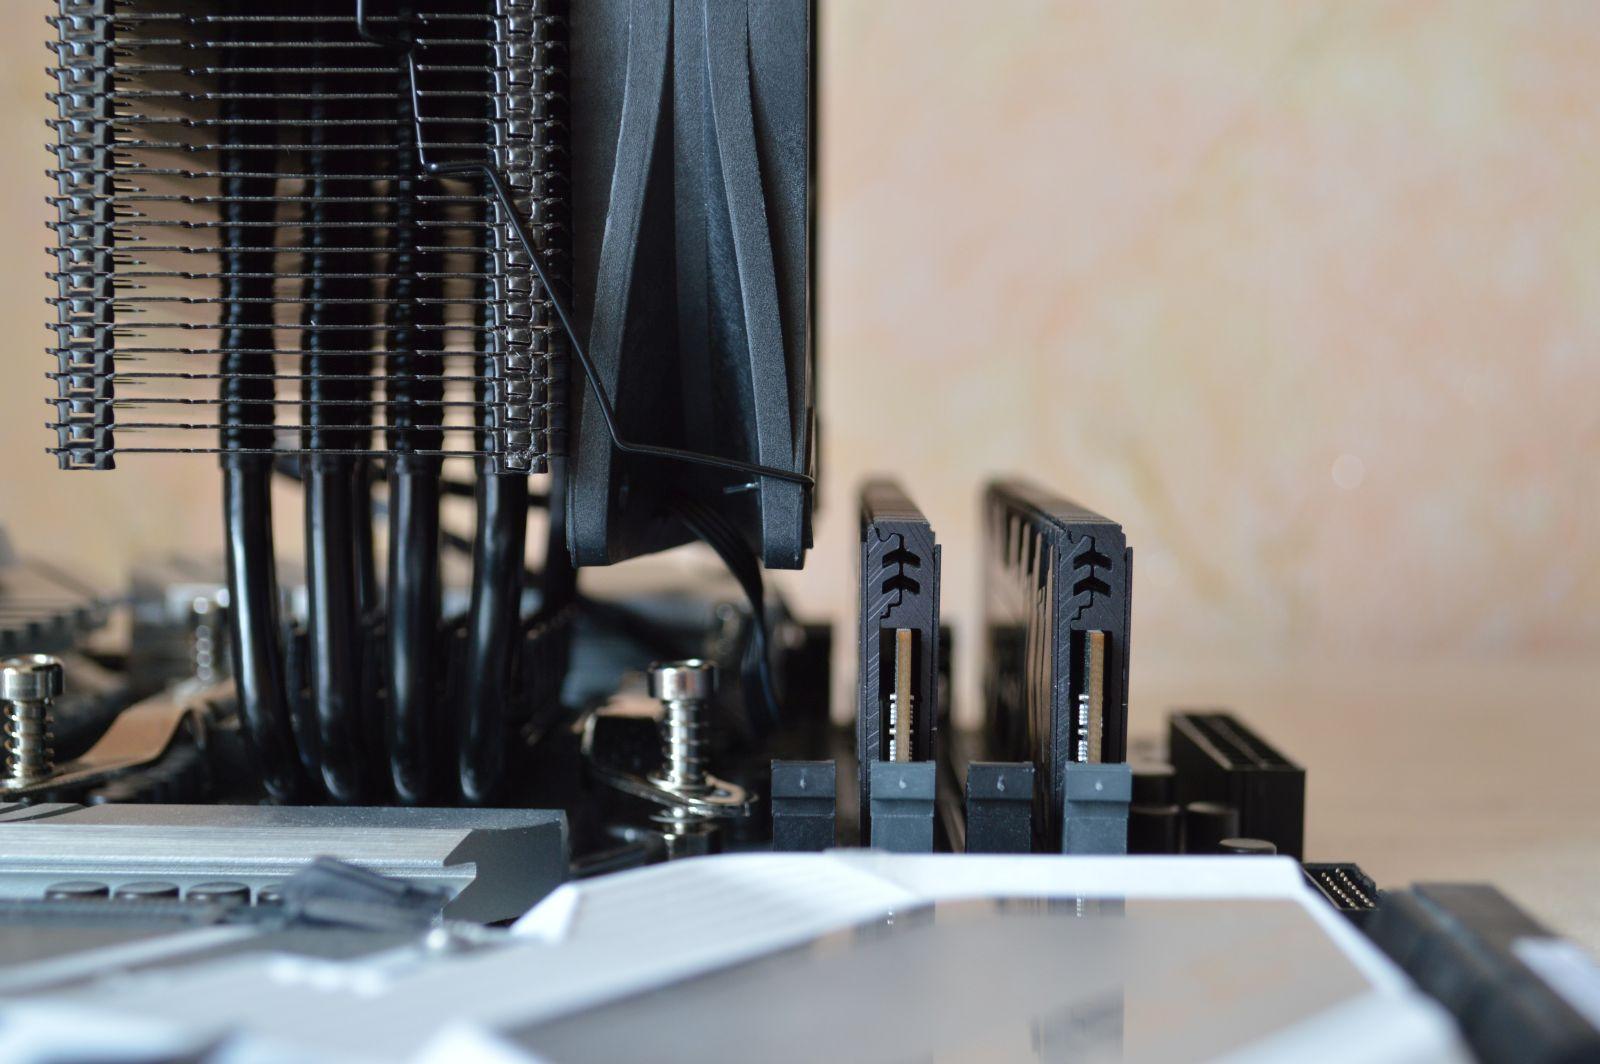 PCCooler GI-X4S D и модули памяти